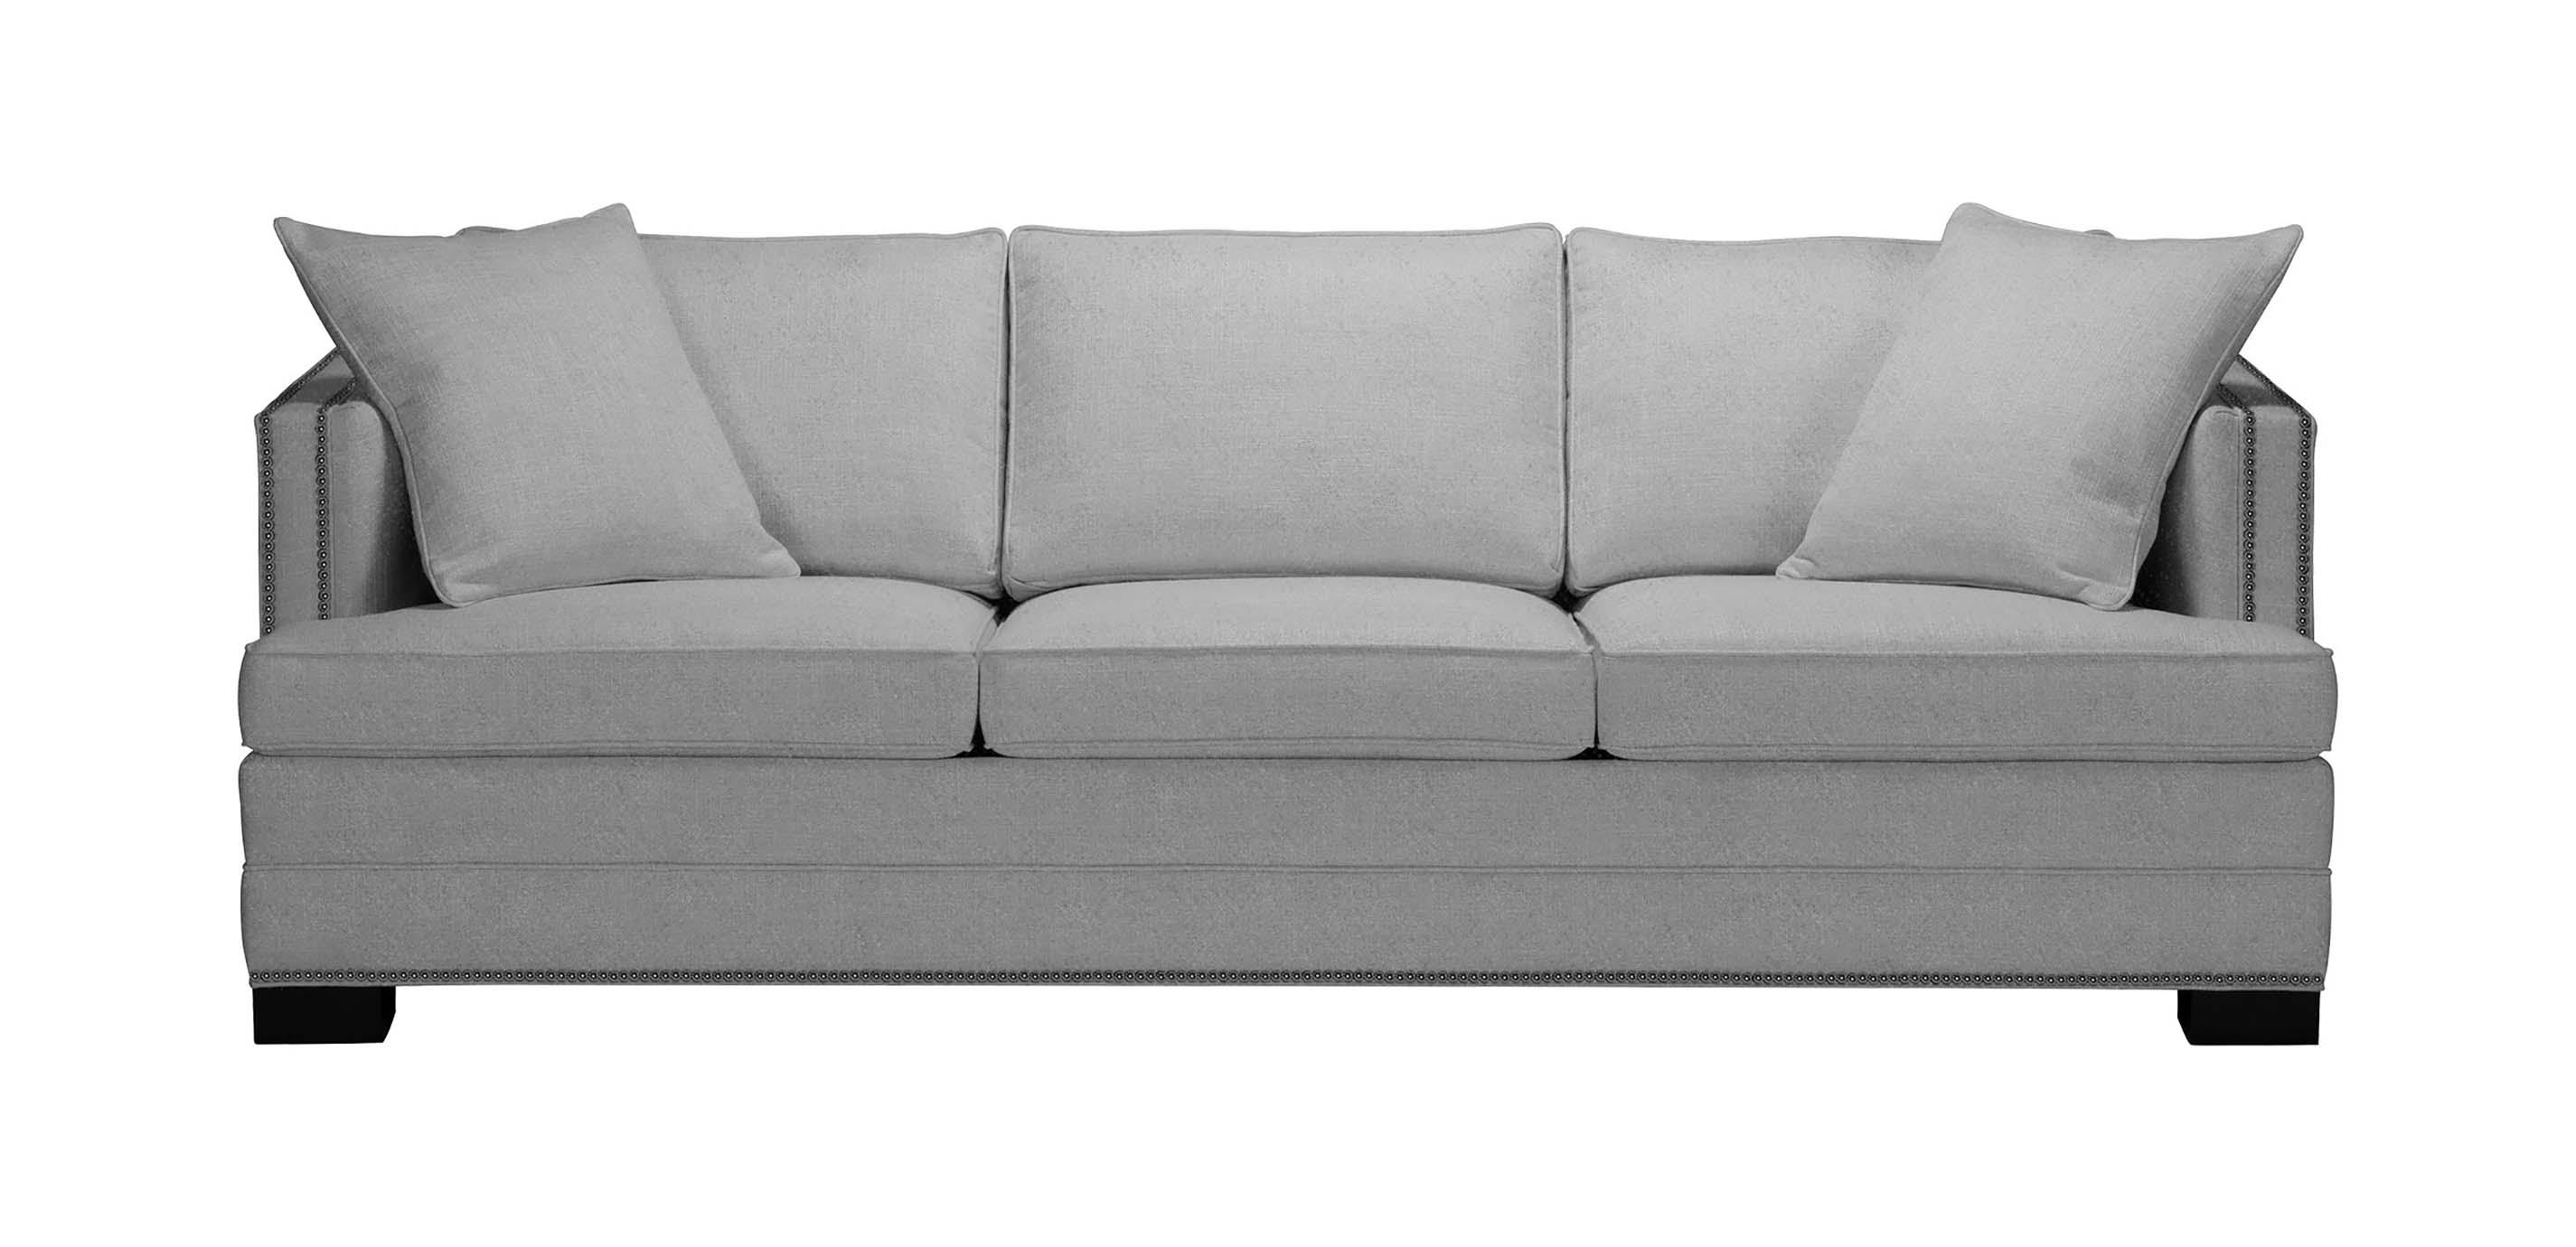 Fabulous Astor Sofa Sofas Loveseats Ethan Allen Andrewgaddart Wooden Chair Designs For Living Room Andrewgaddartcom